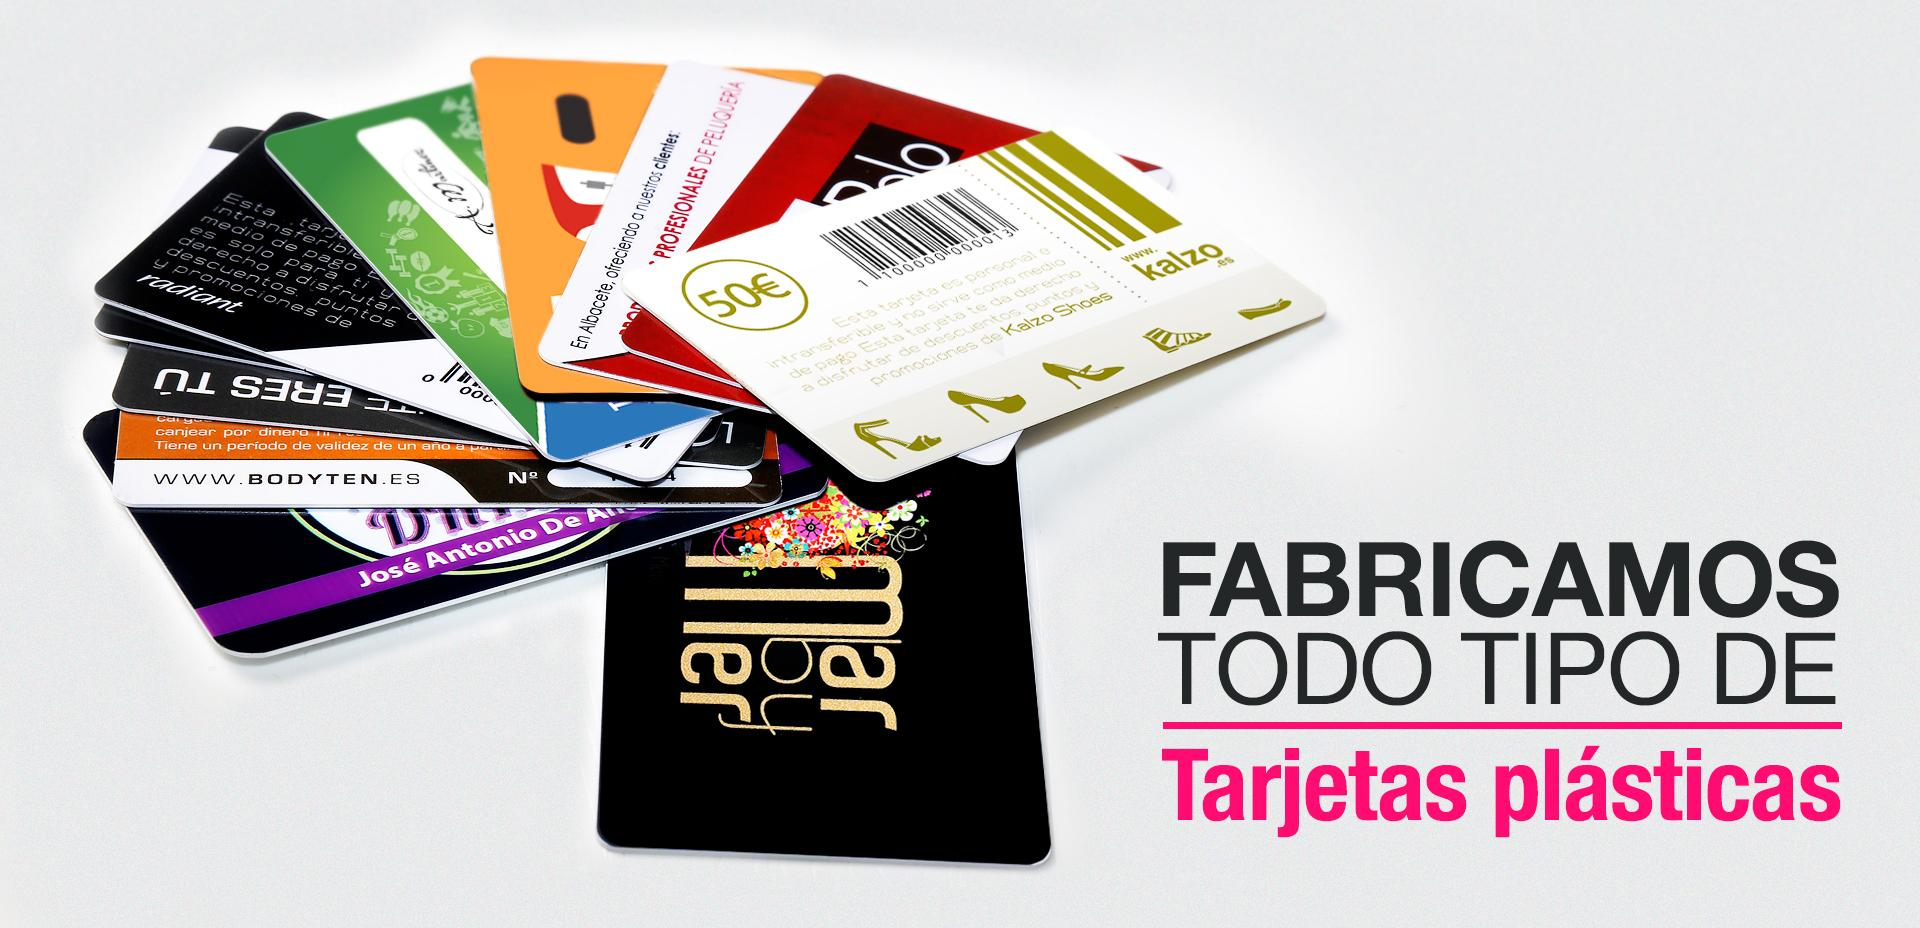 Fábrica de tarjetas de pvc